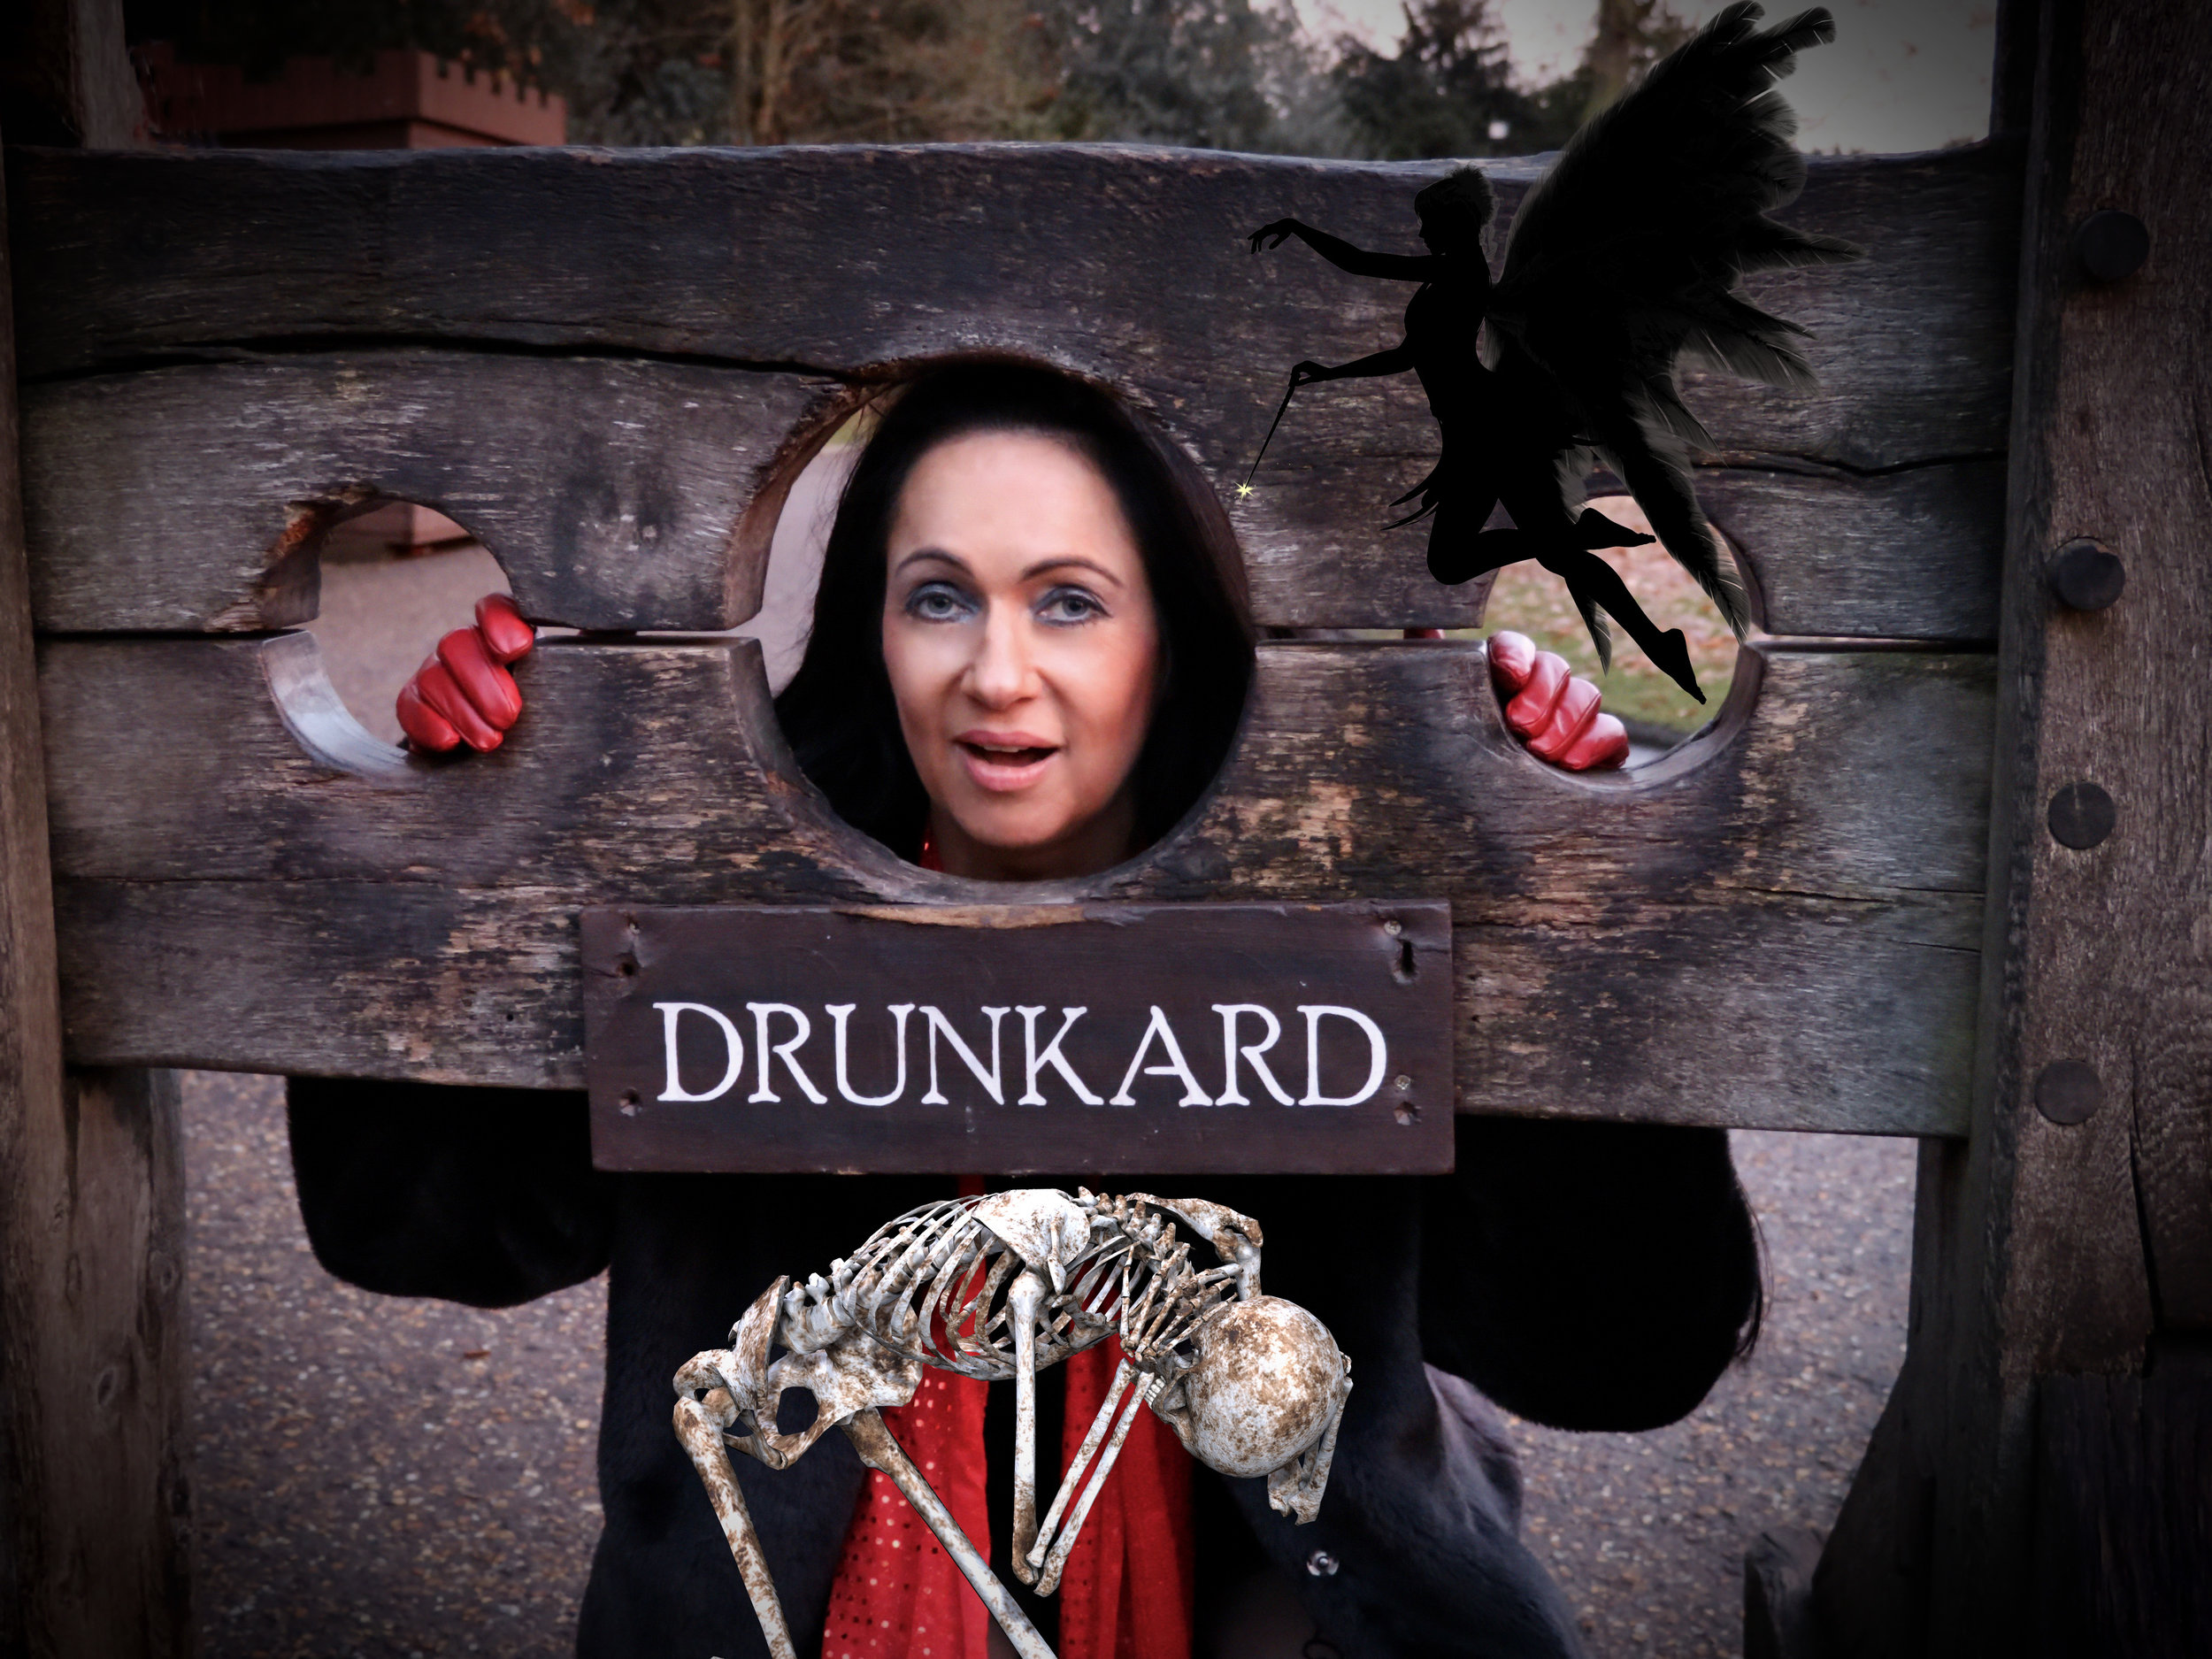 drunkard-judy.jpg